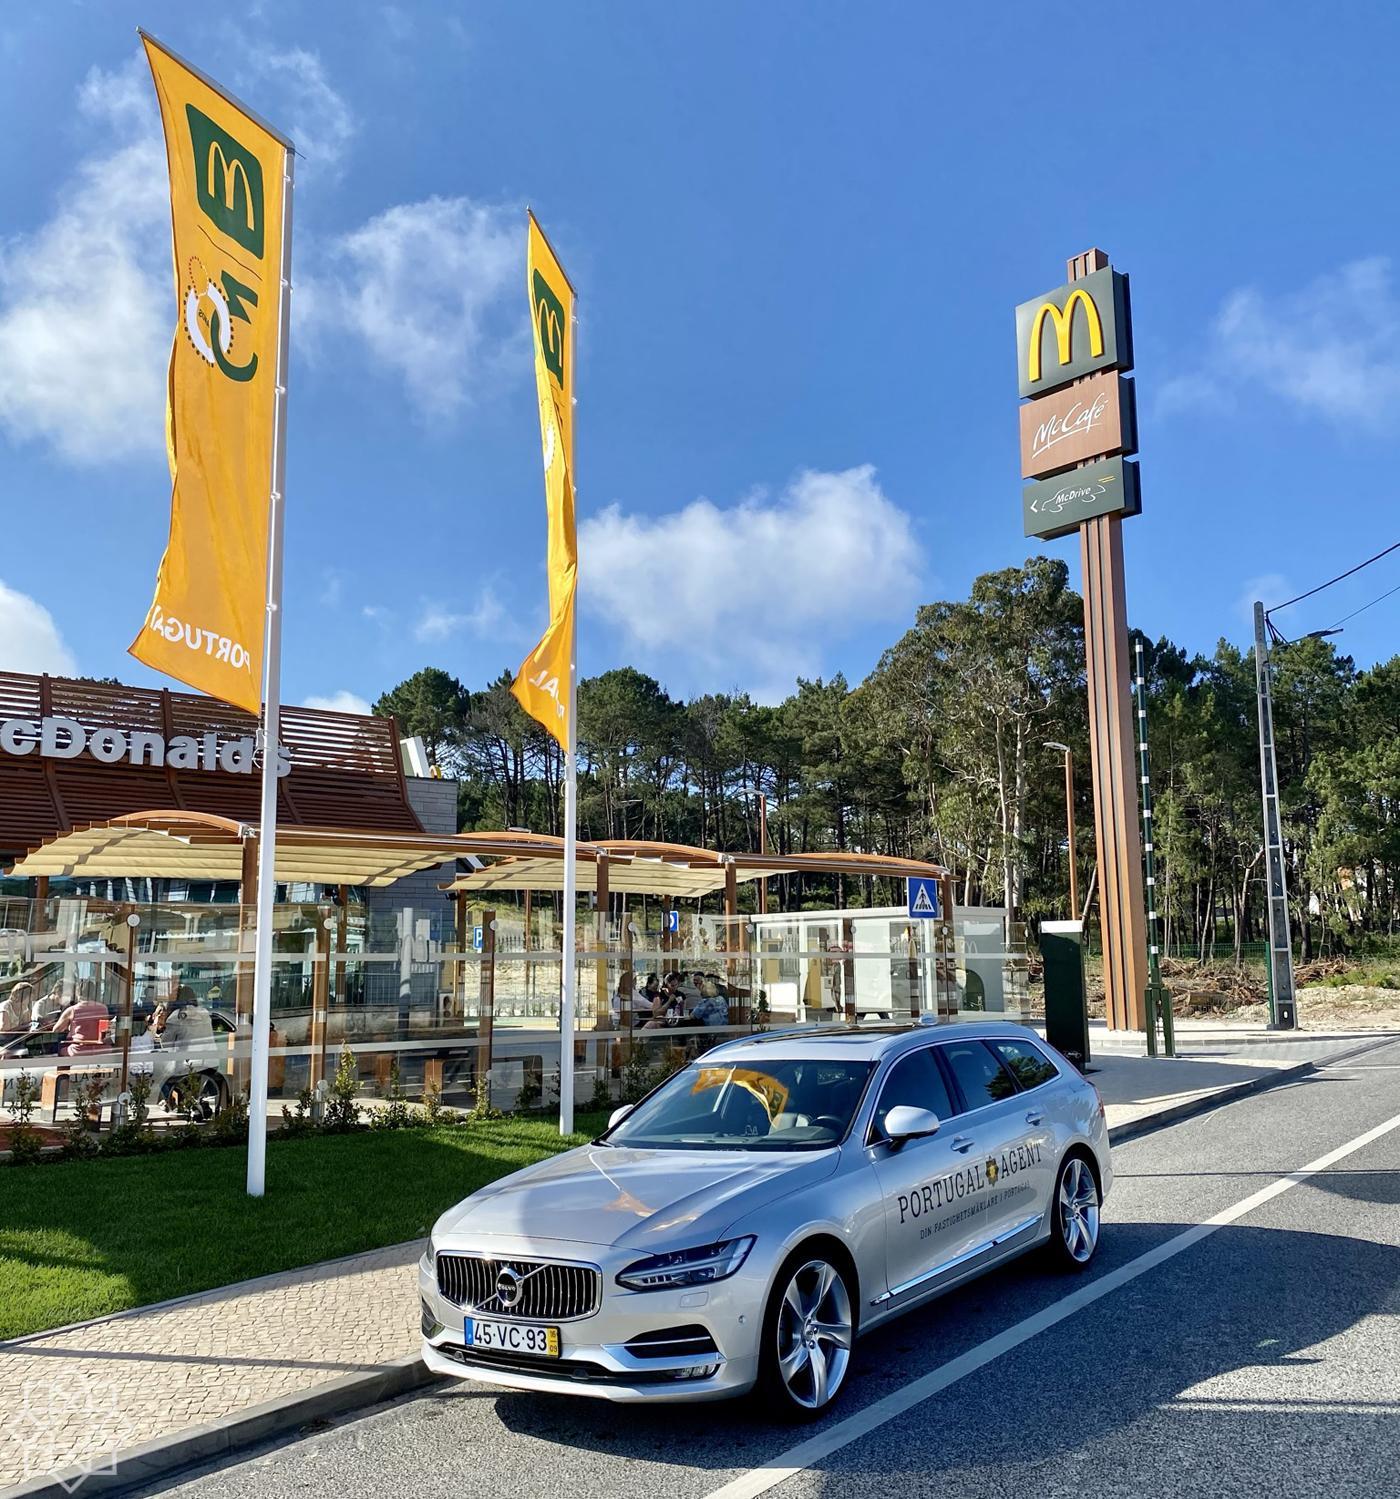 McDonald's in Nazaré